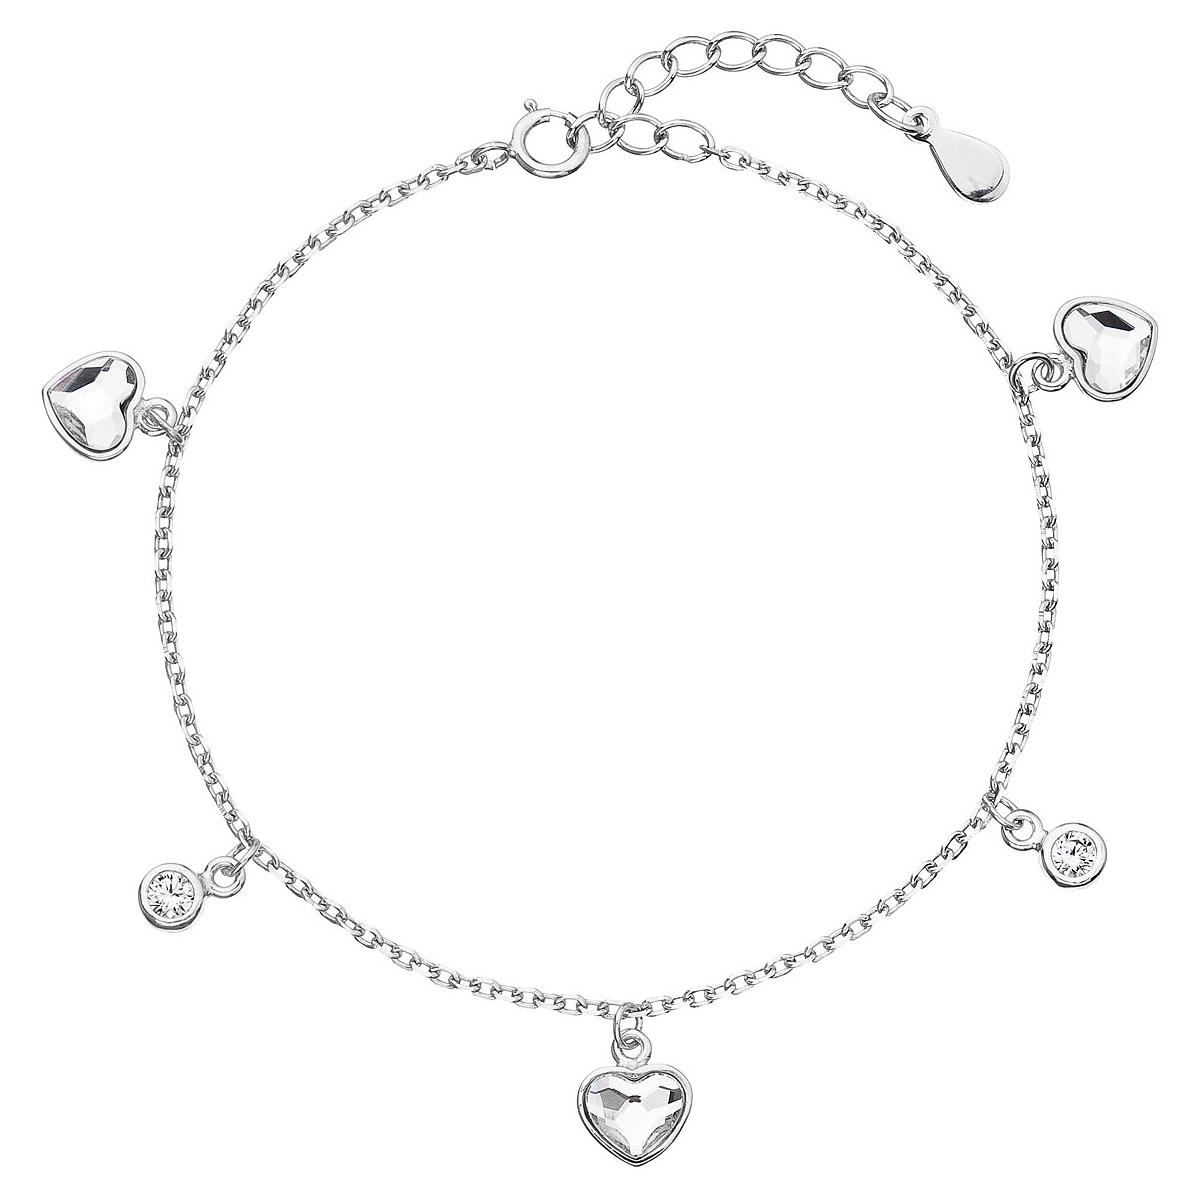 Stříbrný náramek se srdíčky a kamínky Crystals from Swarovski® EG7053